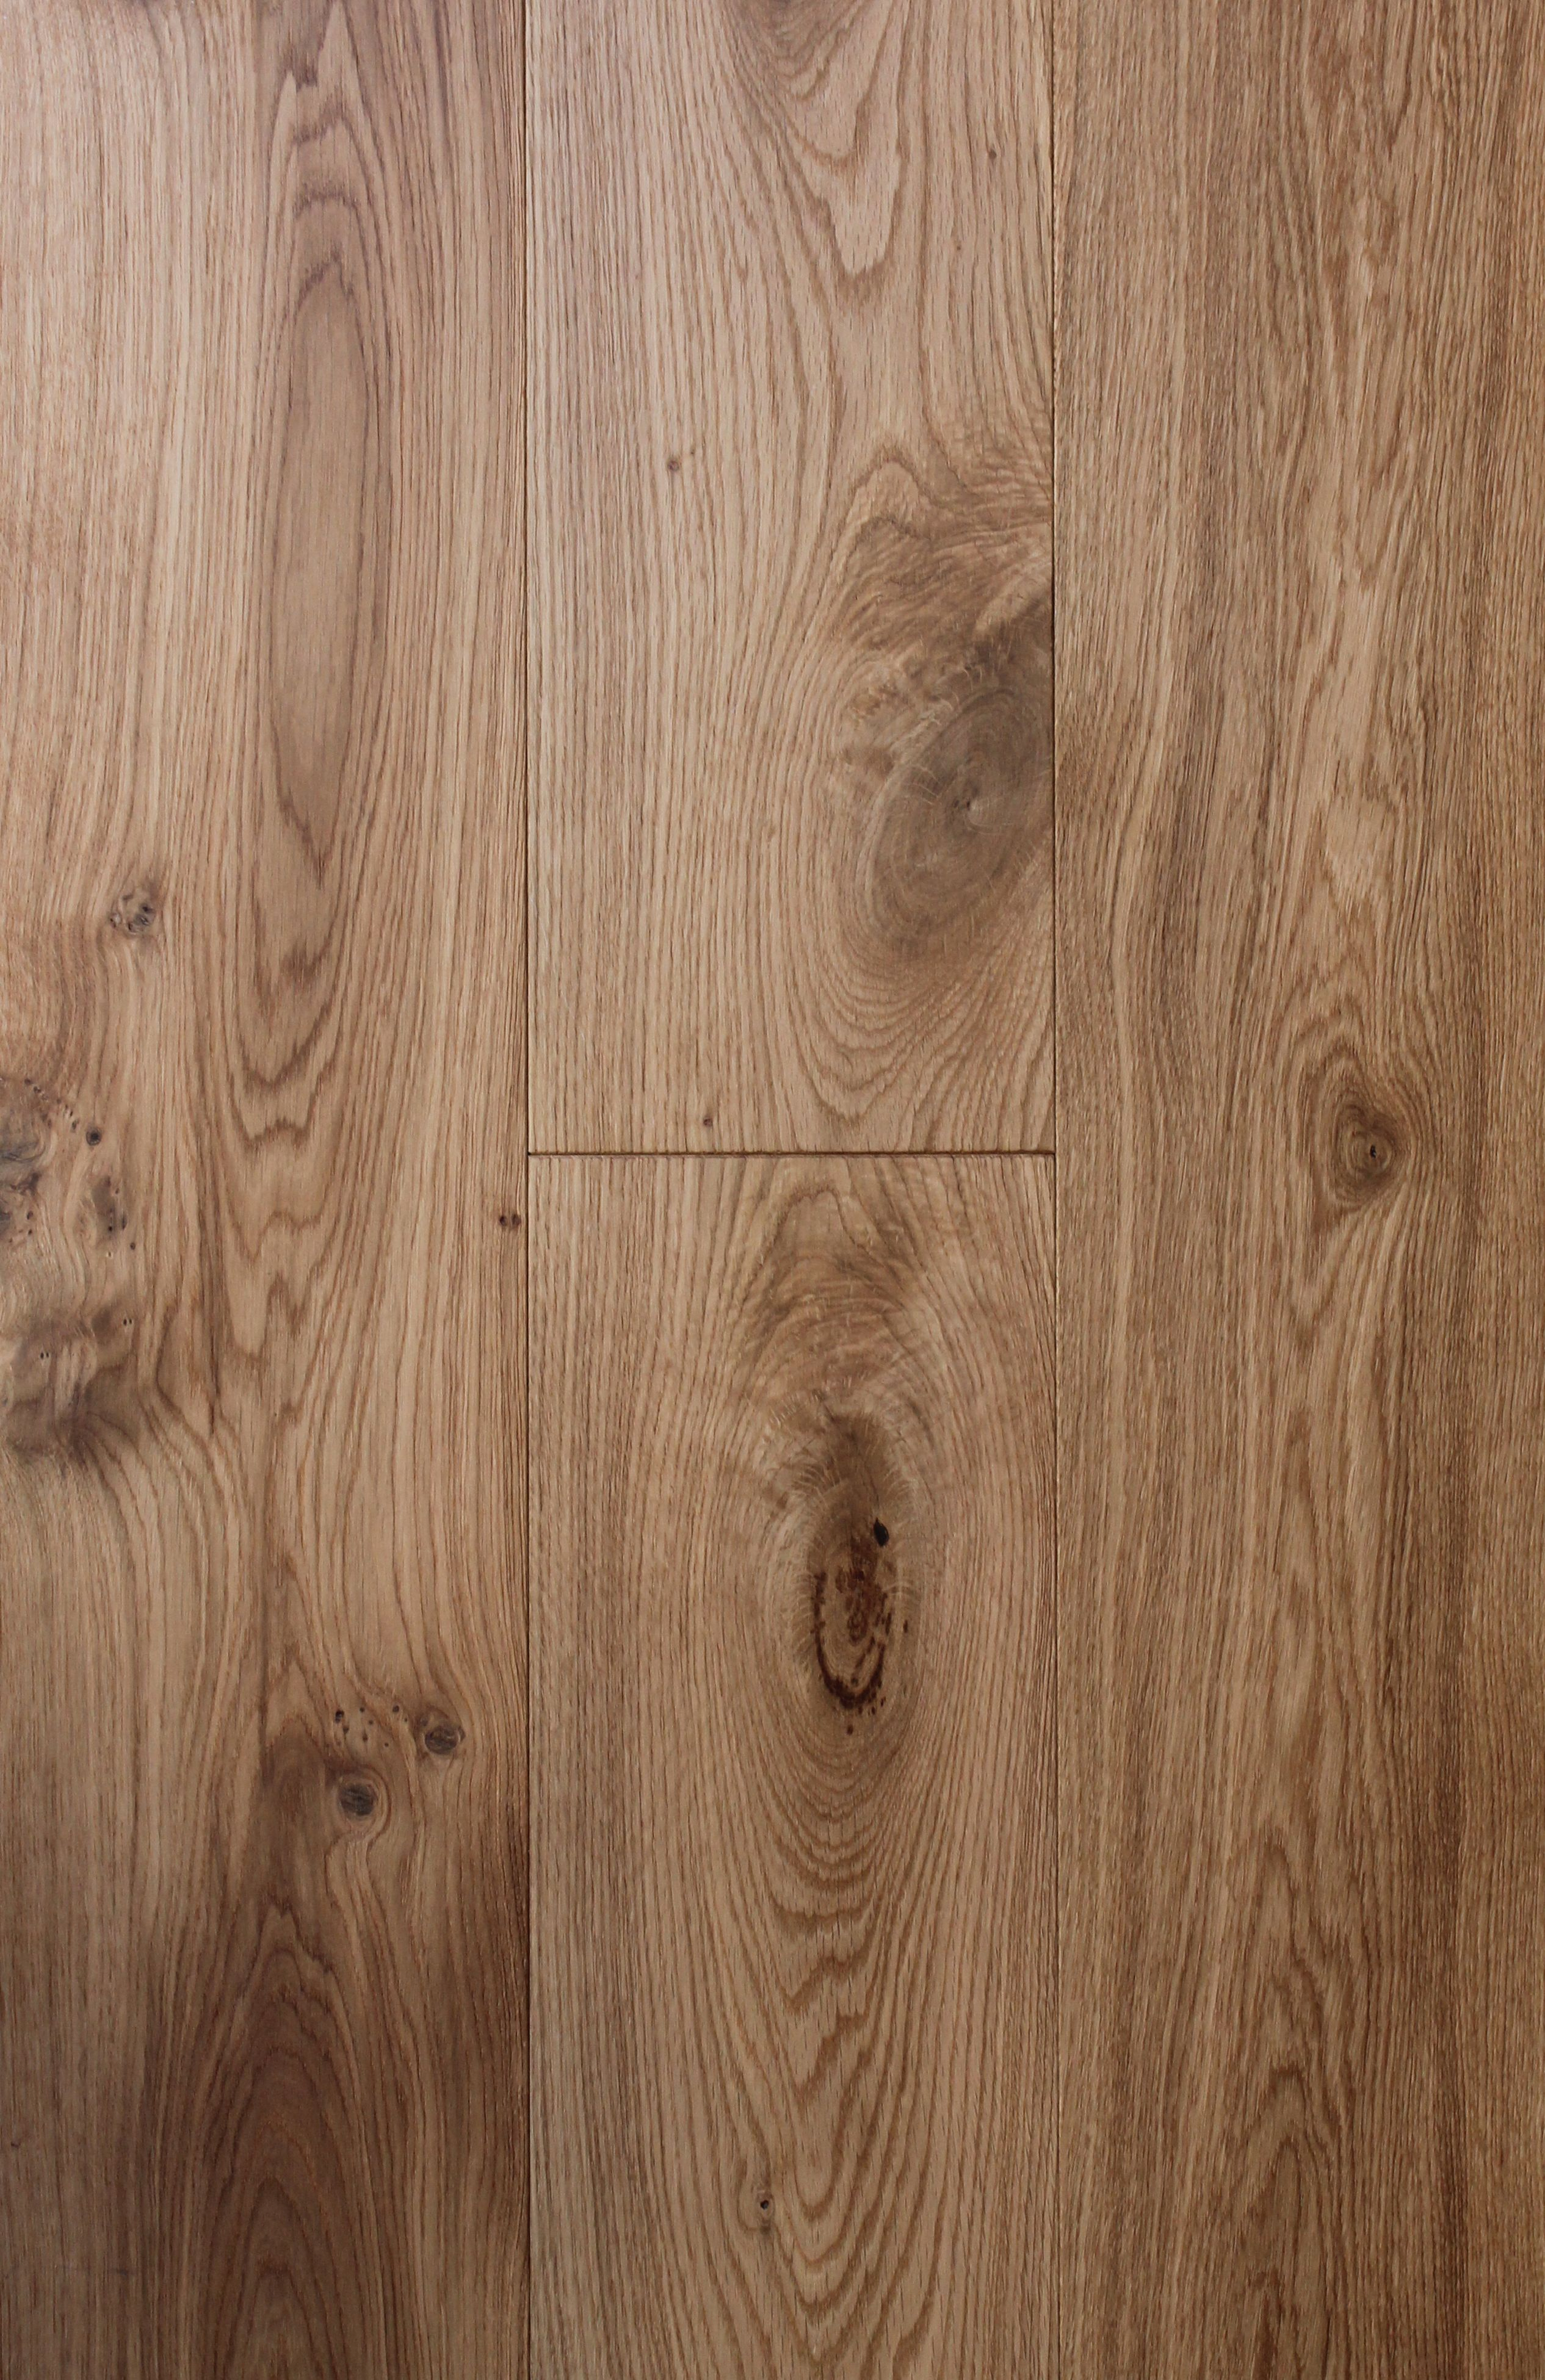 Avola natural european oak zealsea timber flooring timber flooring